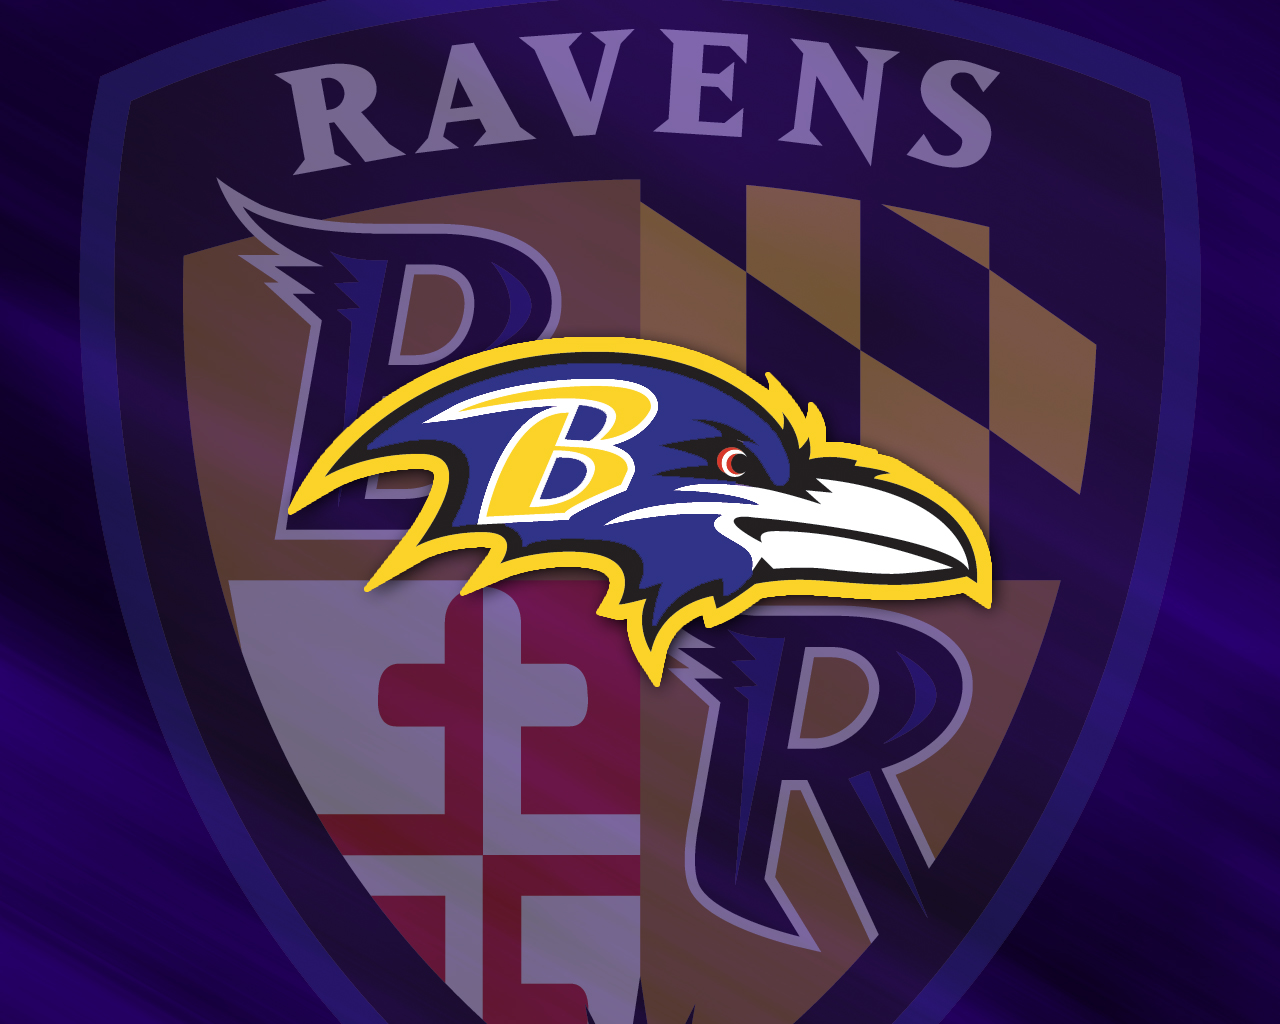 Download Baltimore Ravens wallpaper ravens logo 1280x1024